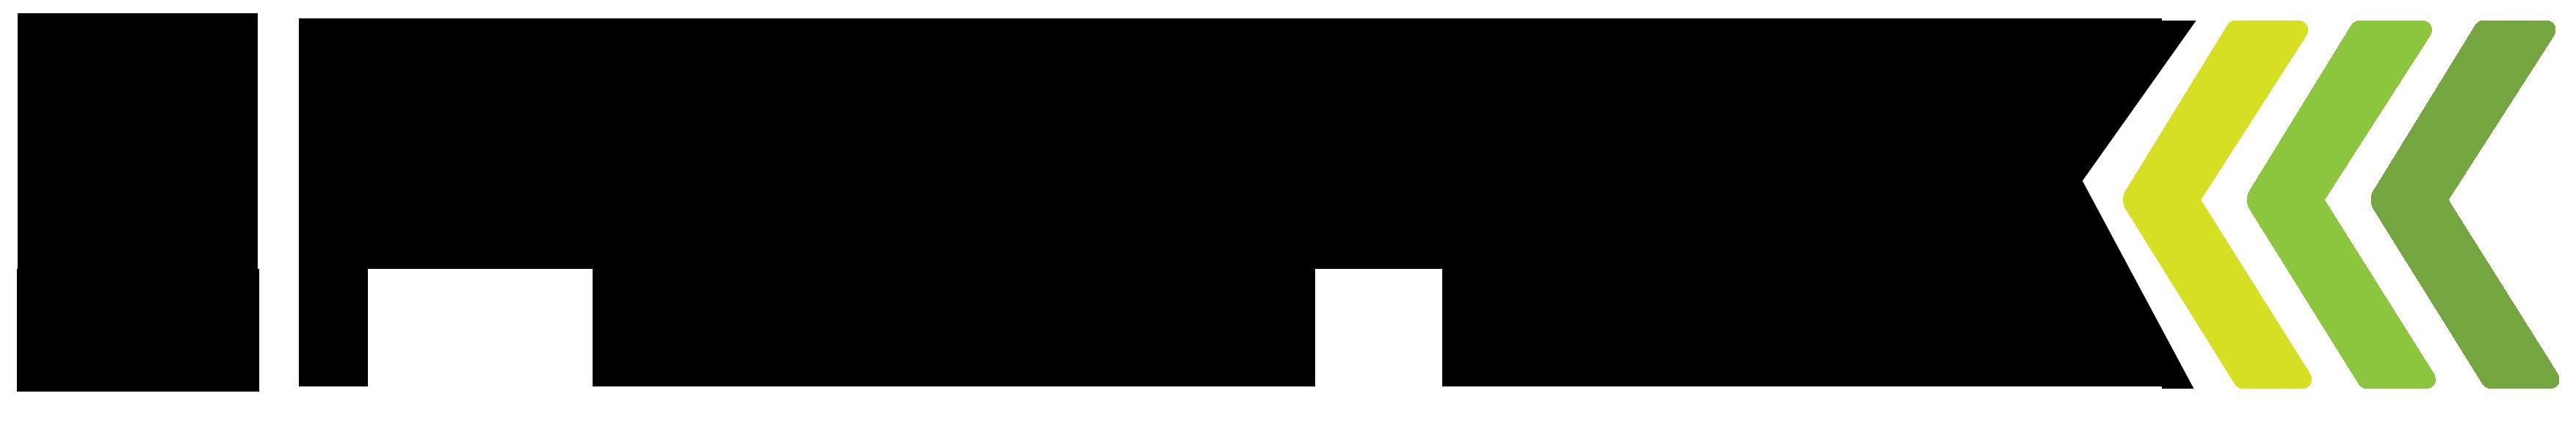 Spektrix logo